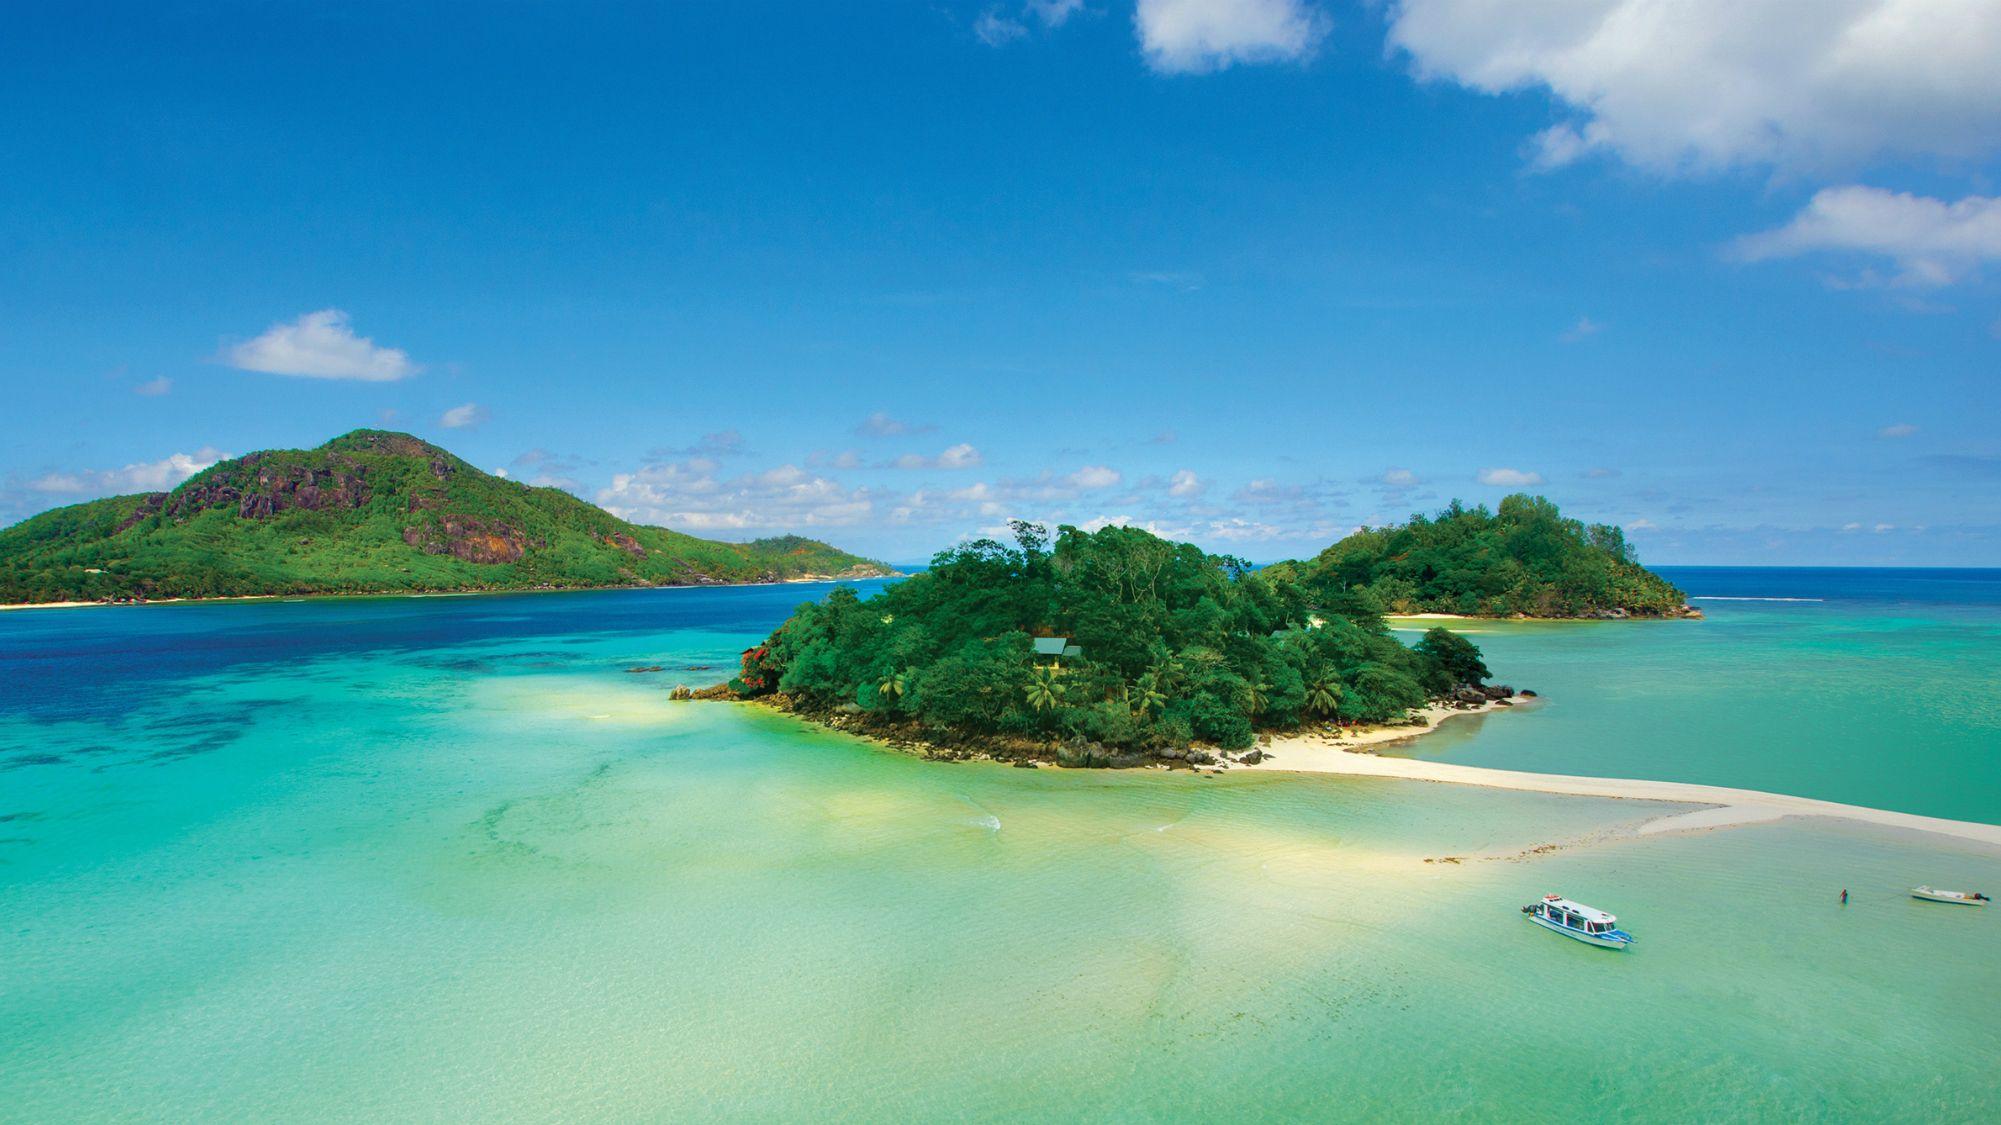 seychelles island tourism